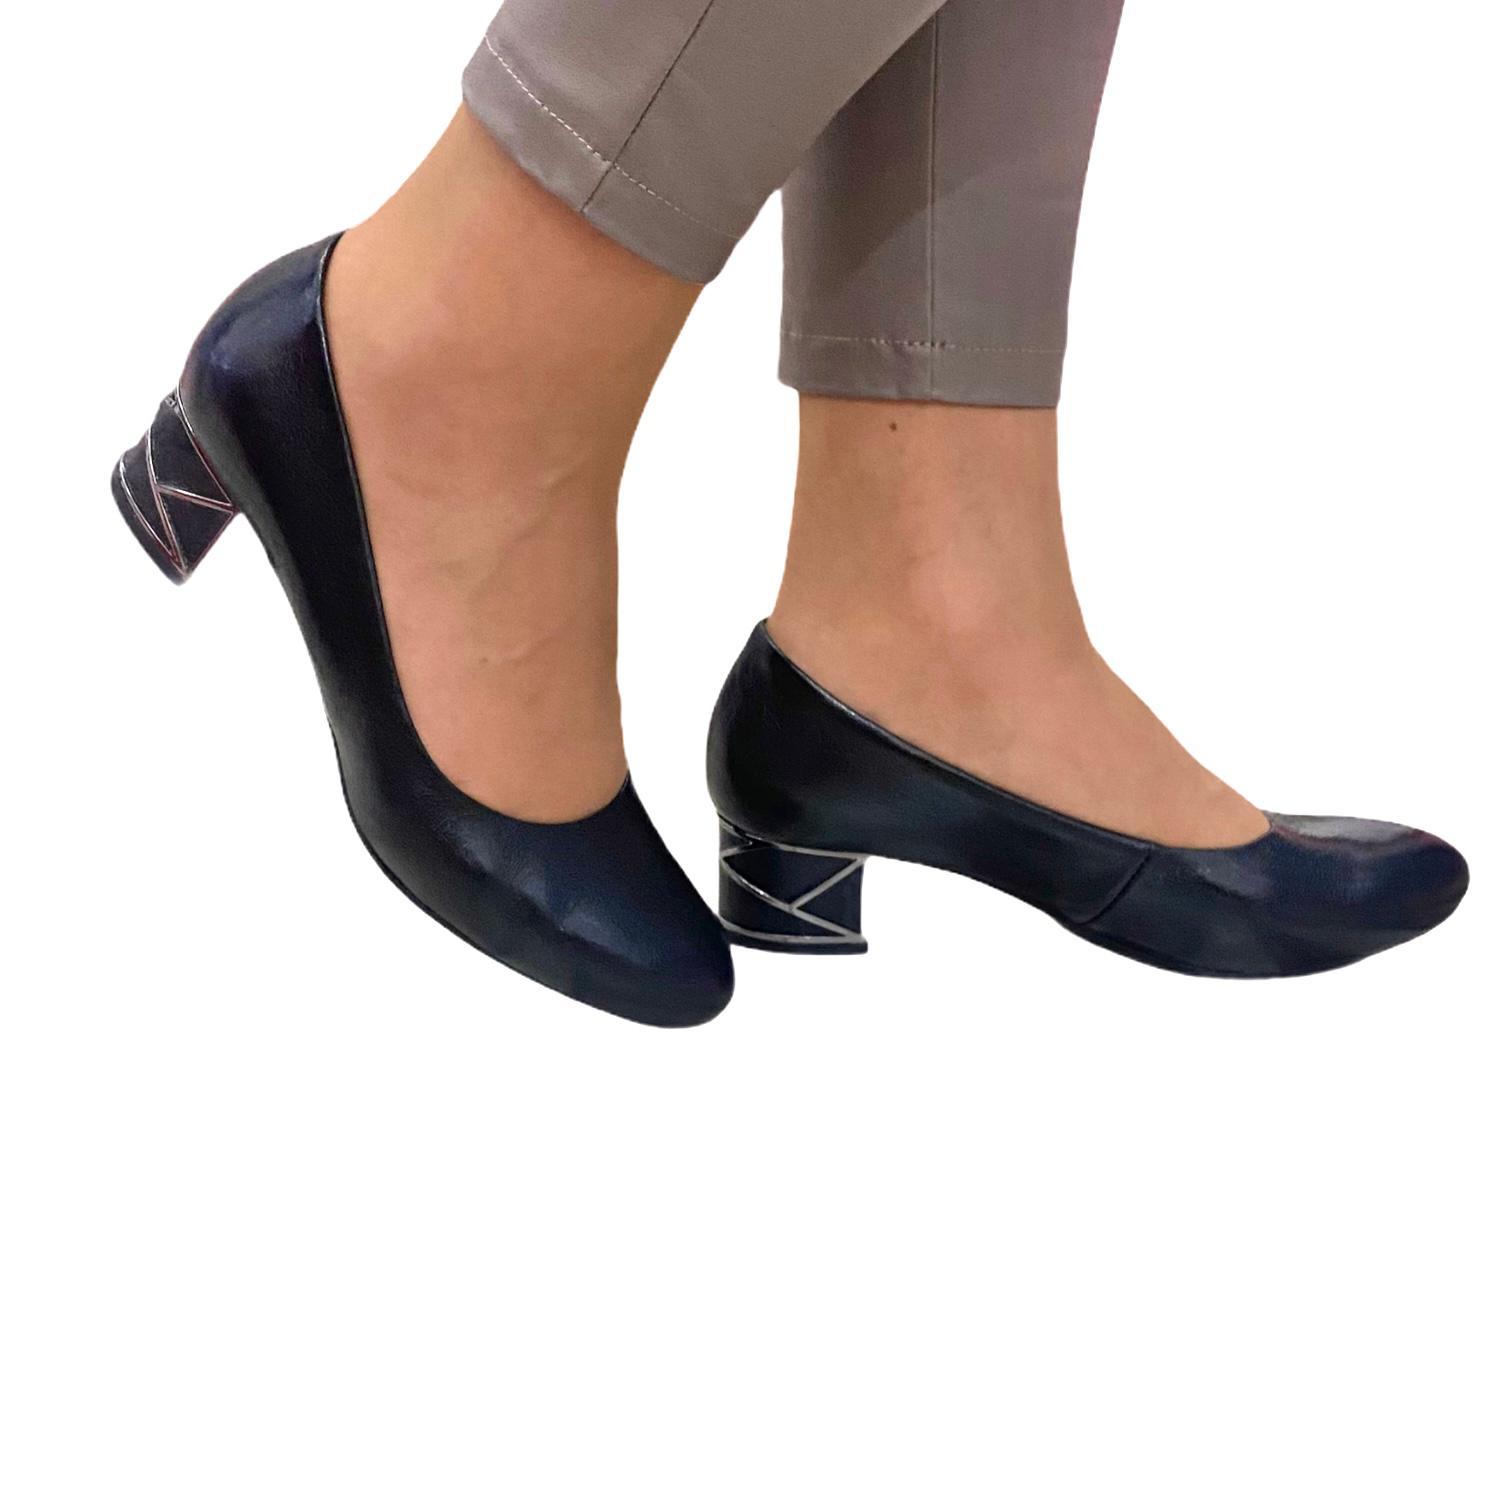 Pantofi Kordel negri cu toc cu model metalic